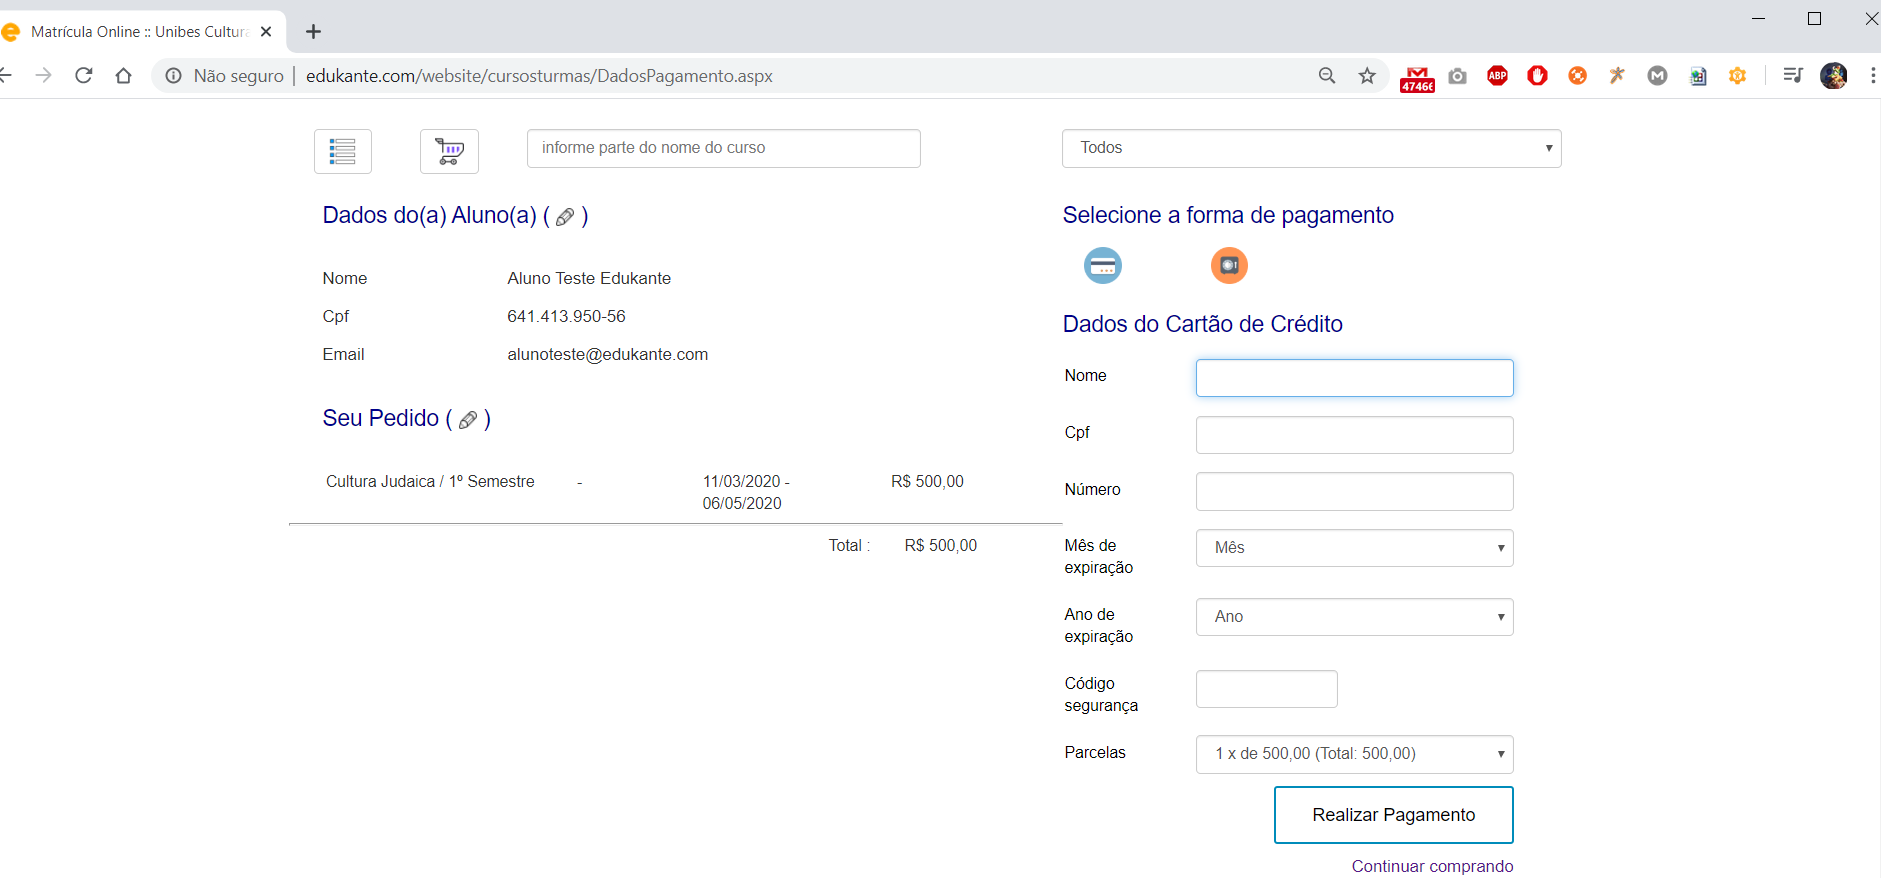 Software para Pagamento Online da Matrícula